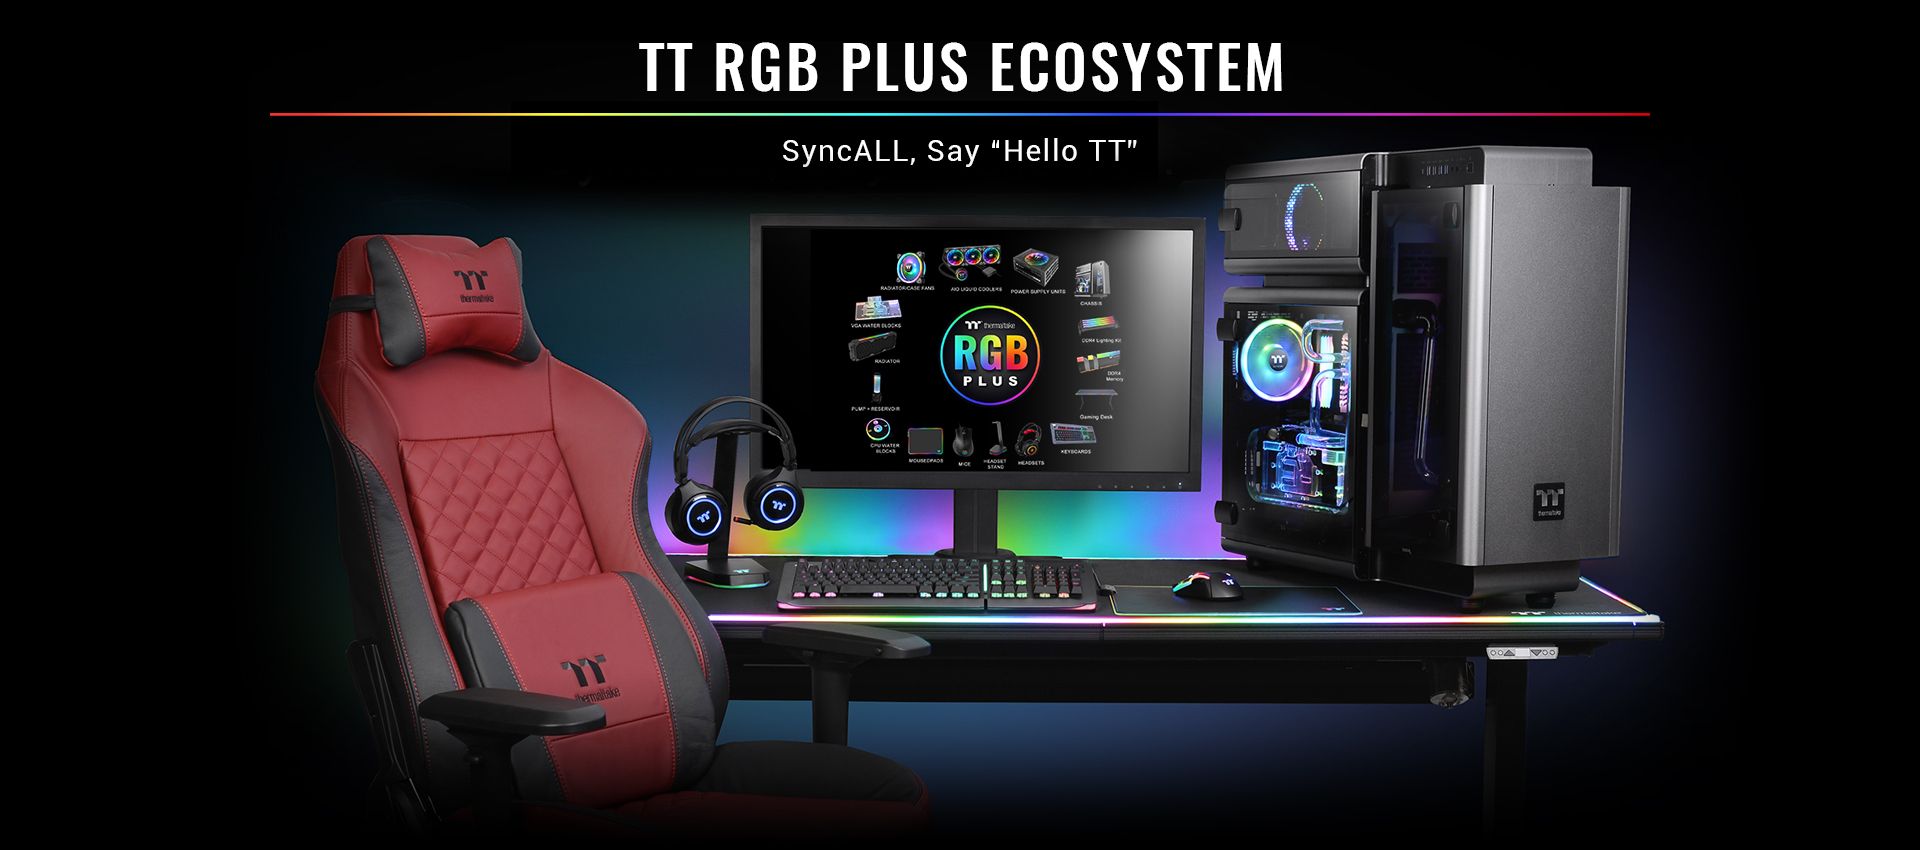 TT RGB PLUS ECOSYSTEM